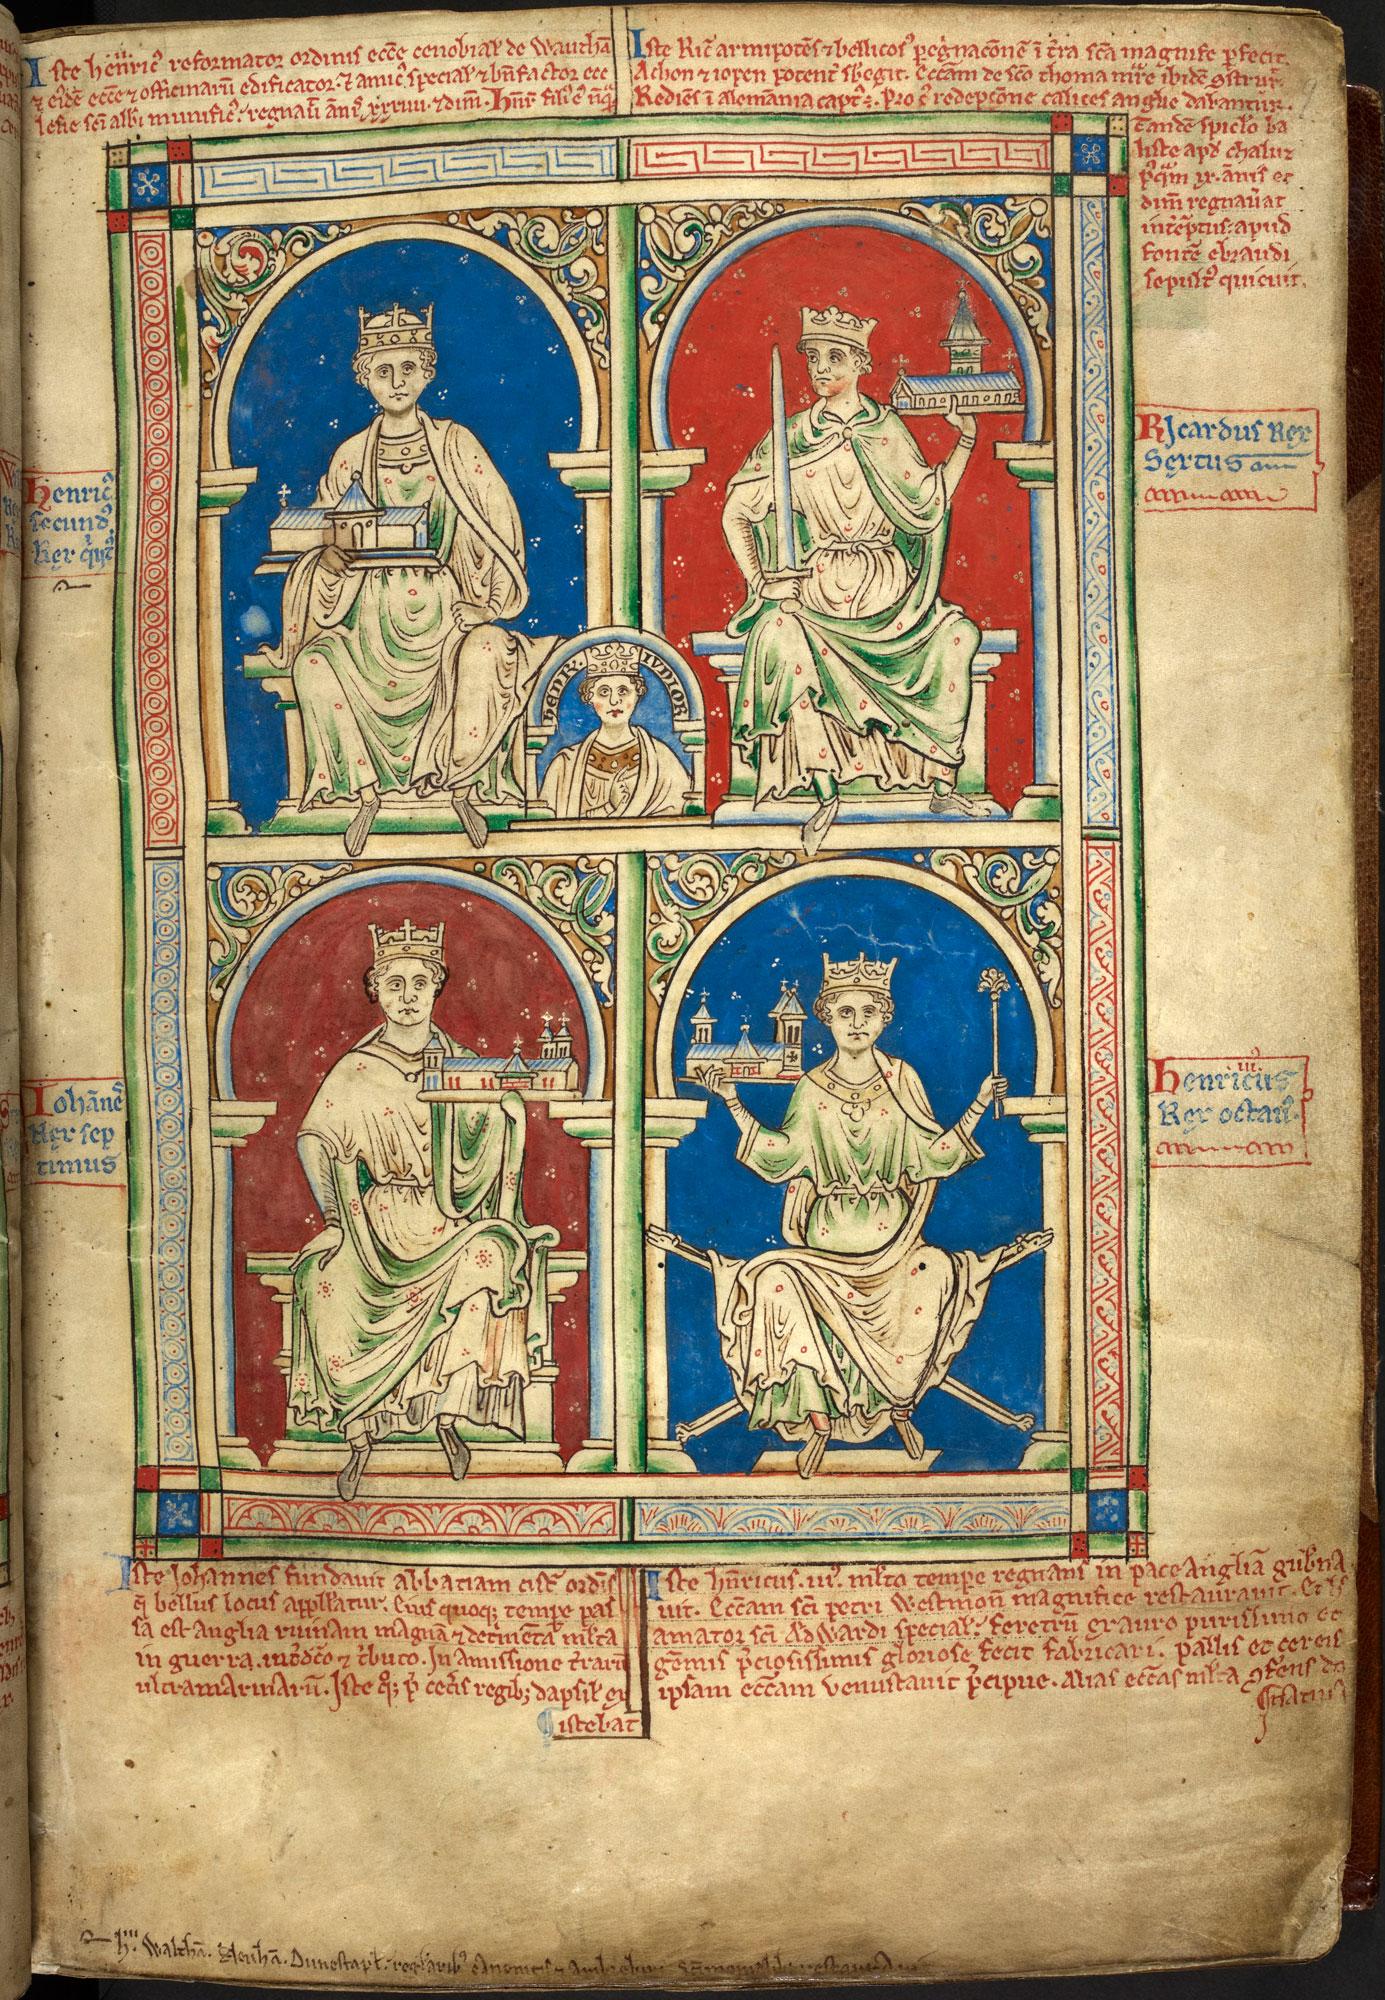 Portrait of King John from Matthew Paris's Historia Anglorum